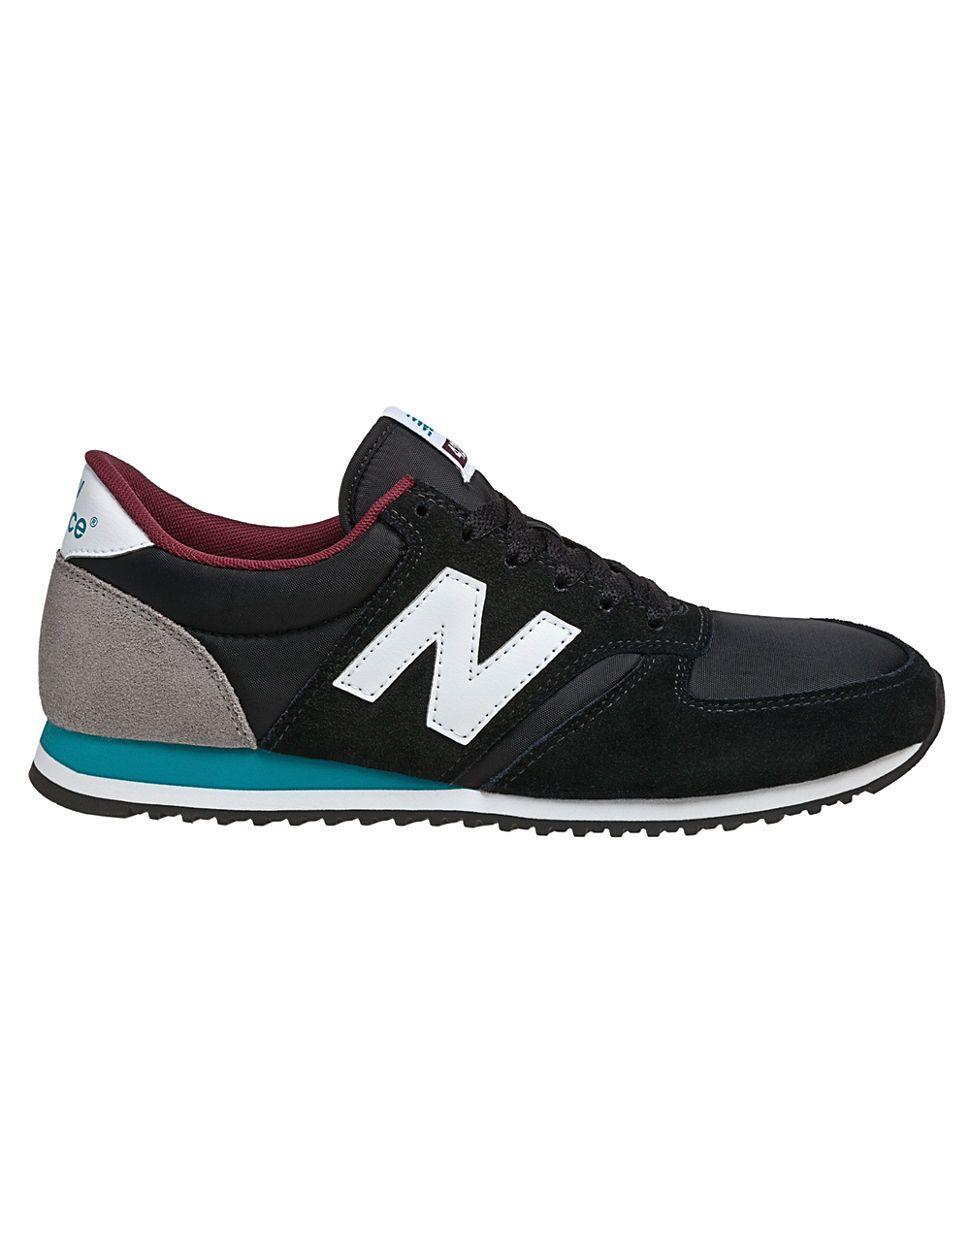 Chaussures New Balance U420 turquoise Casual unisexe fK2DMK9lO